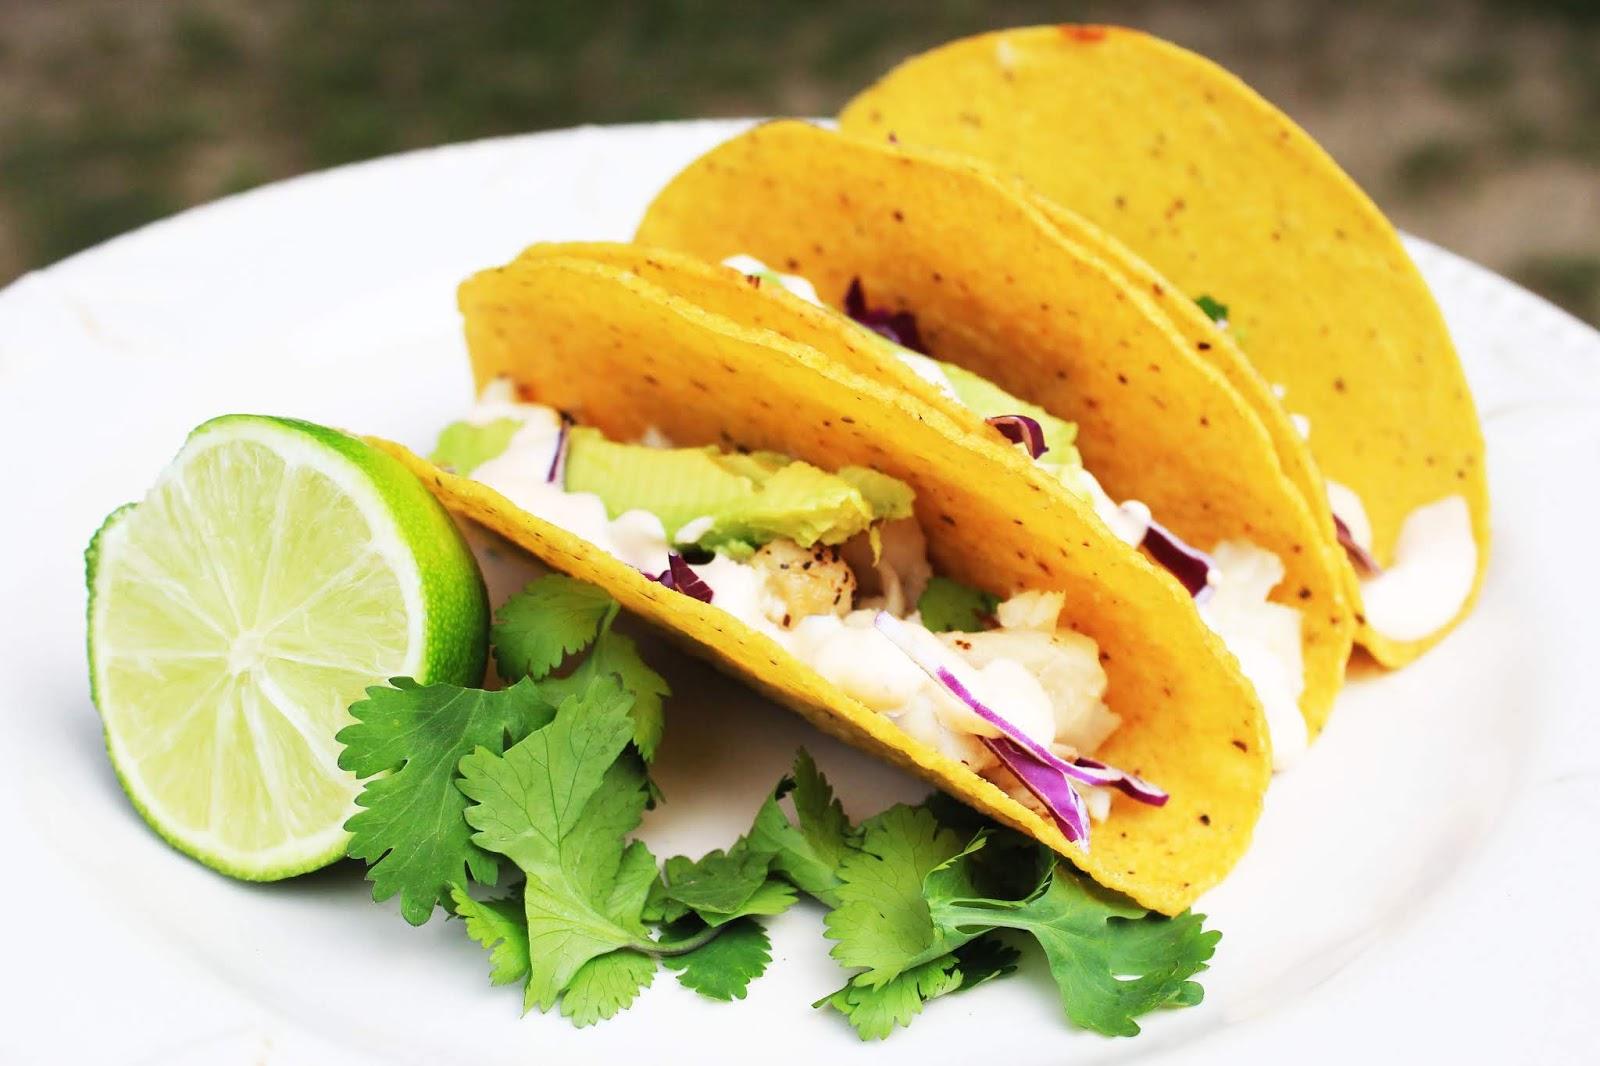 Joshua 39 s girl taco tuesday fish tacos with garlic lime aioli for Fish taco aioli